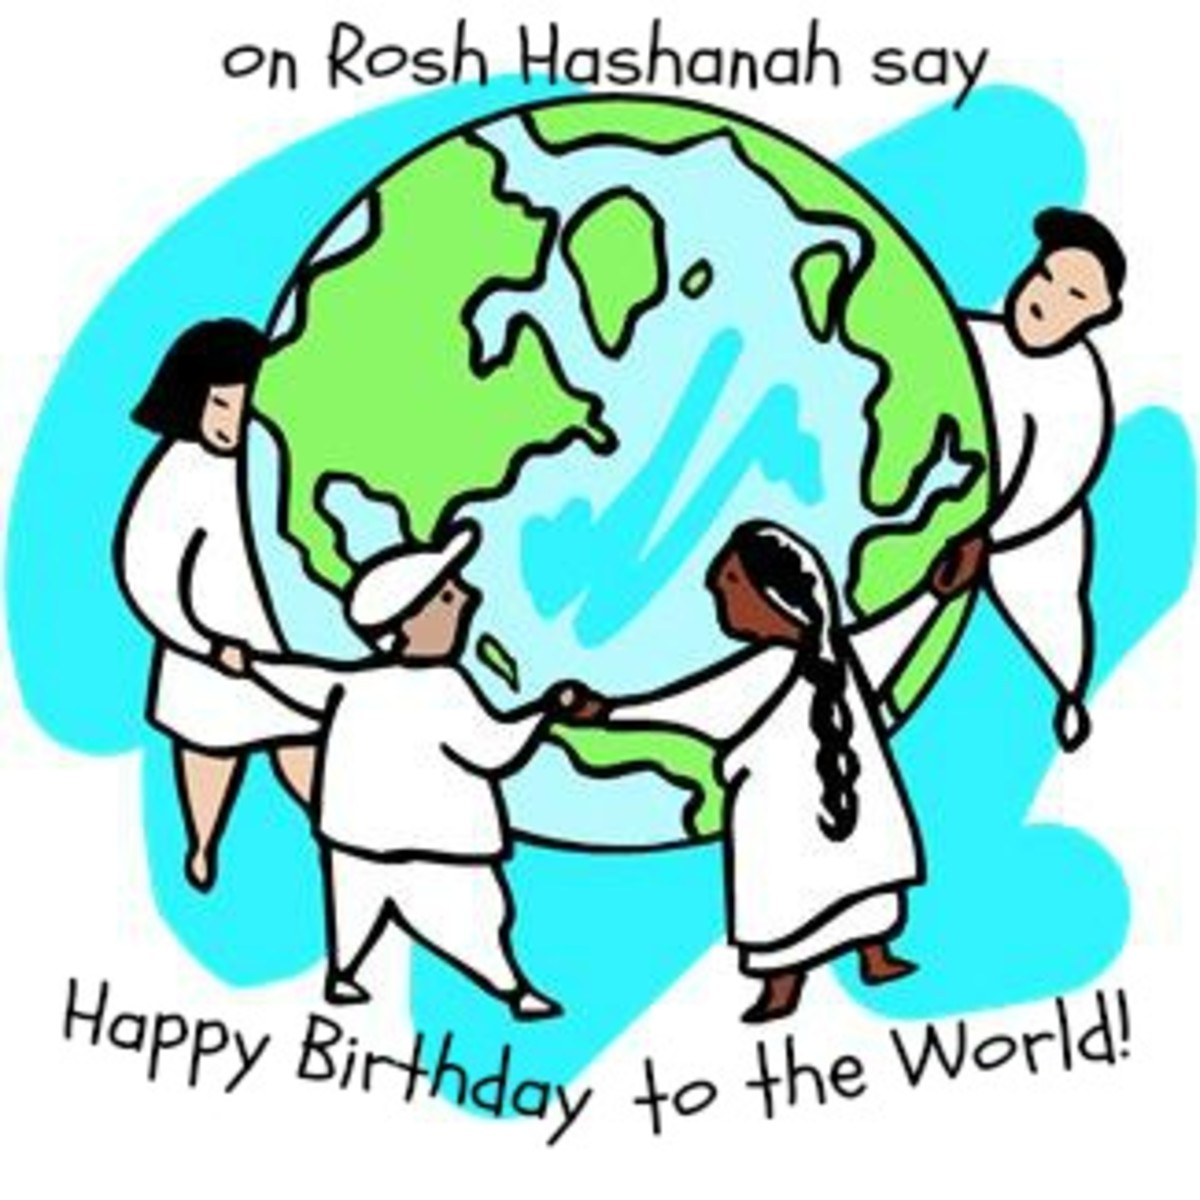 Happy Birthday to the World